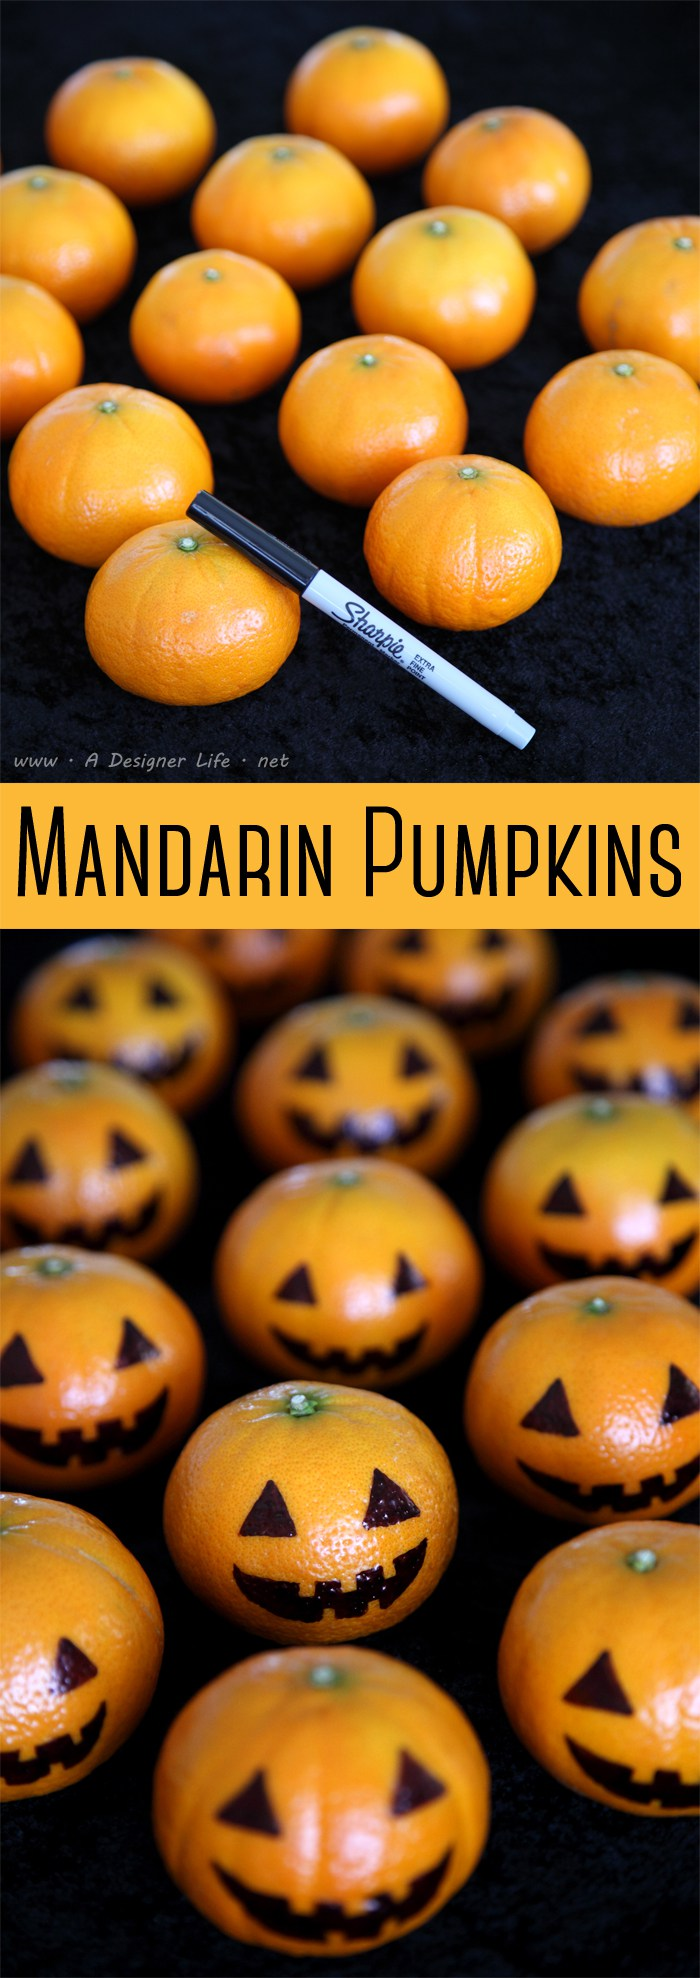 mandarine-pumpkins-small